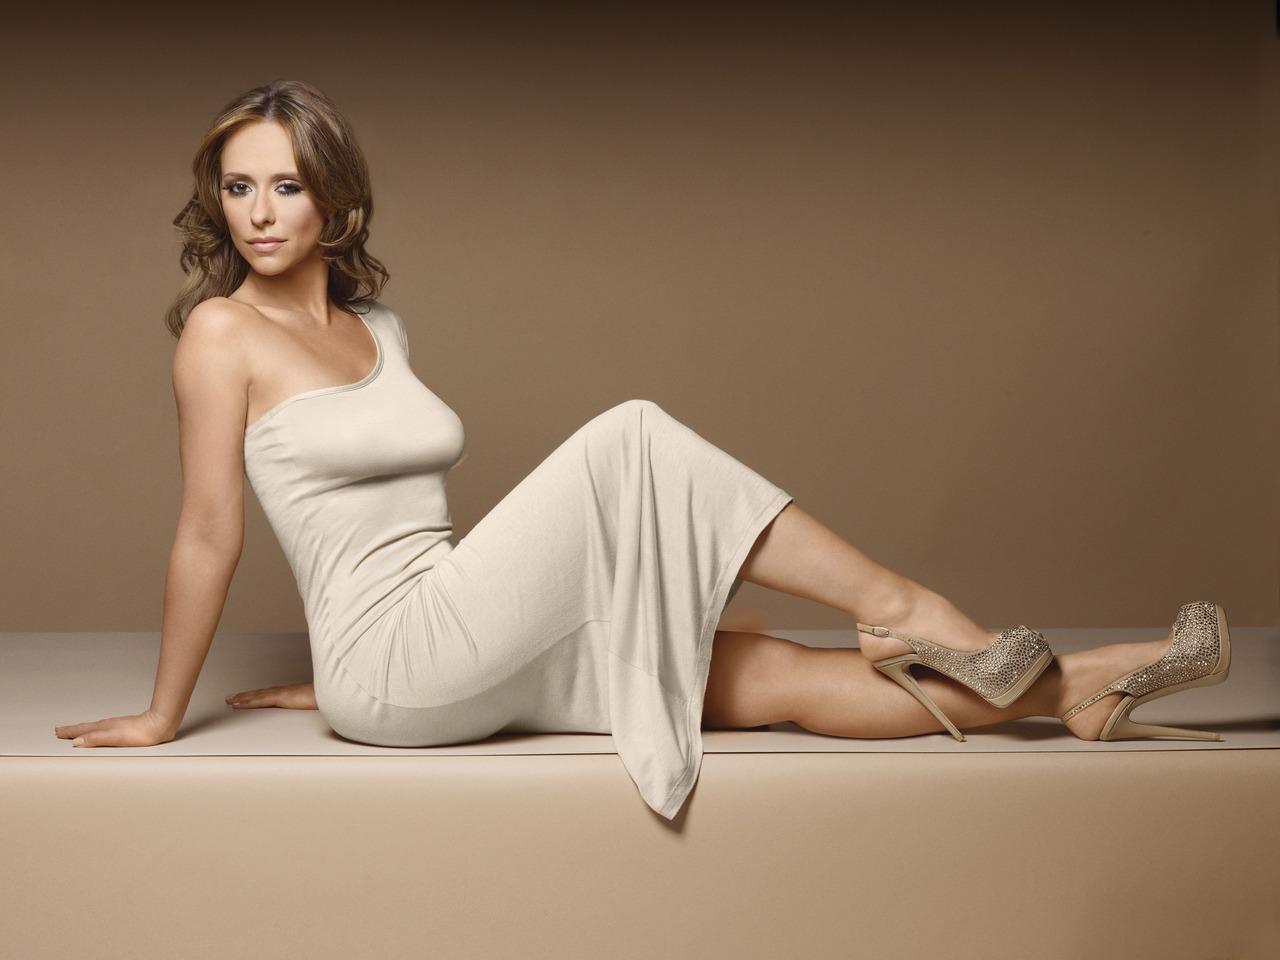 Jennifer Love Hewitt Feet  Celebrity Pictures-4109